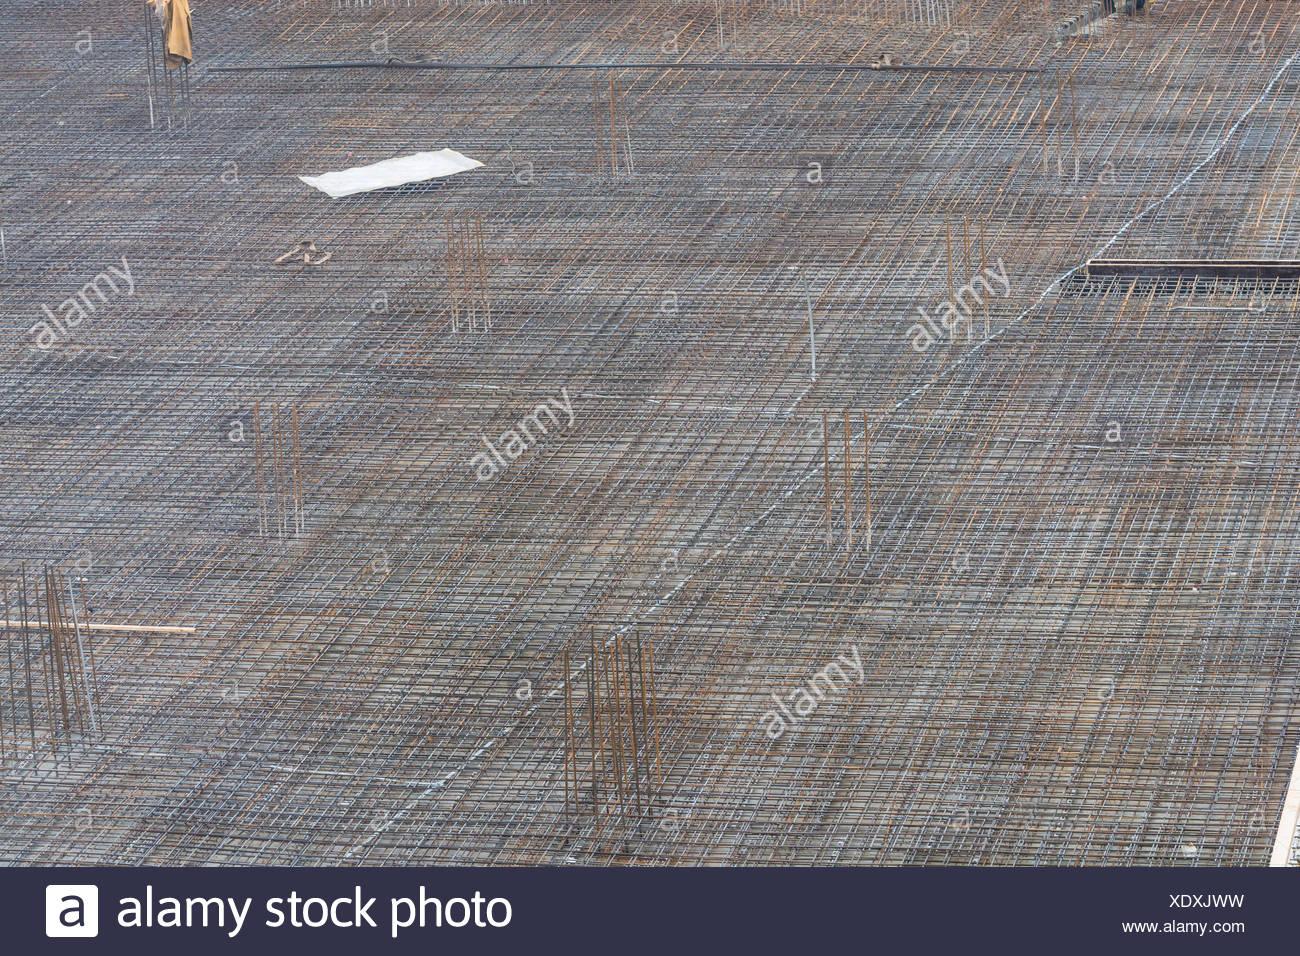 beton schalung stock photos beton schalung stock images alamy. Black Bedroom Furniture Sets. Home Design Ideas